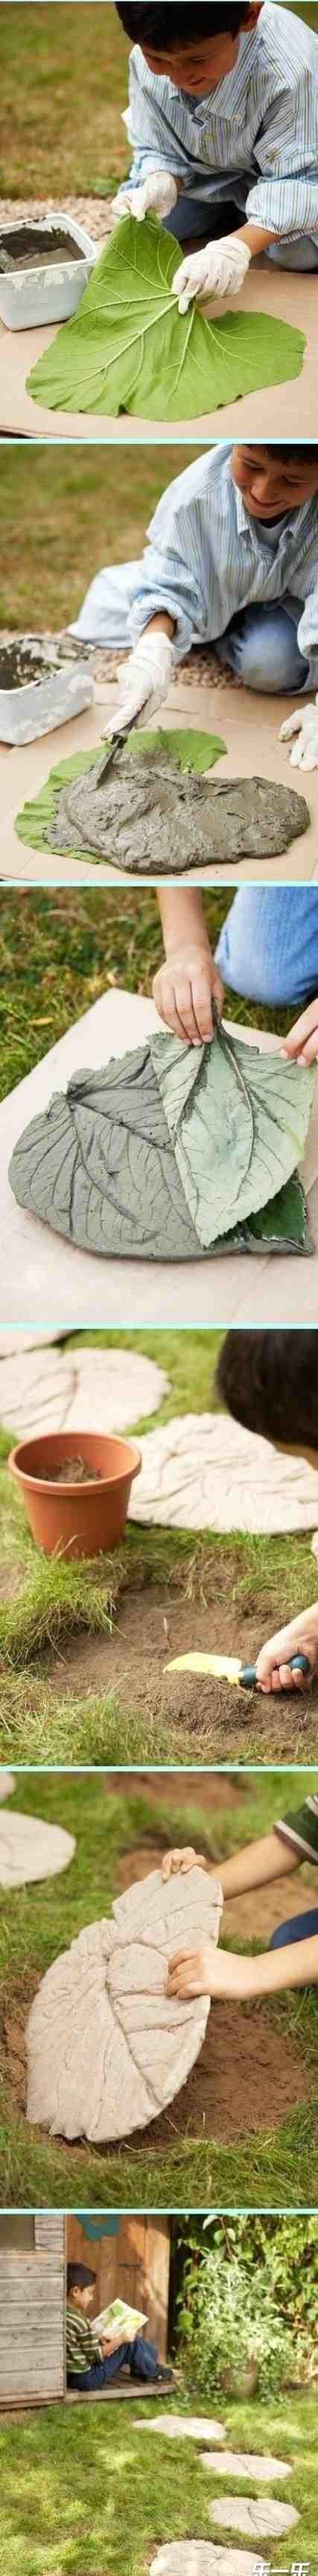 Homemade garden art ideas - Dyi Homemade Garden Decorations Projects Ideas Rhubarb Leaf Concrete Stepping Stones